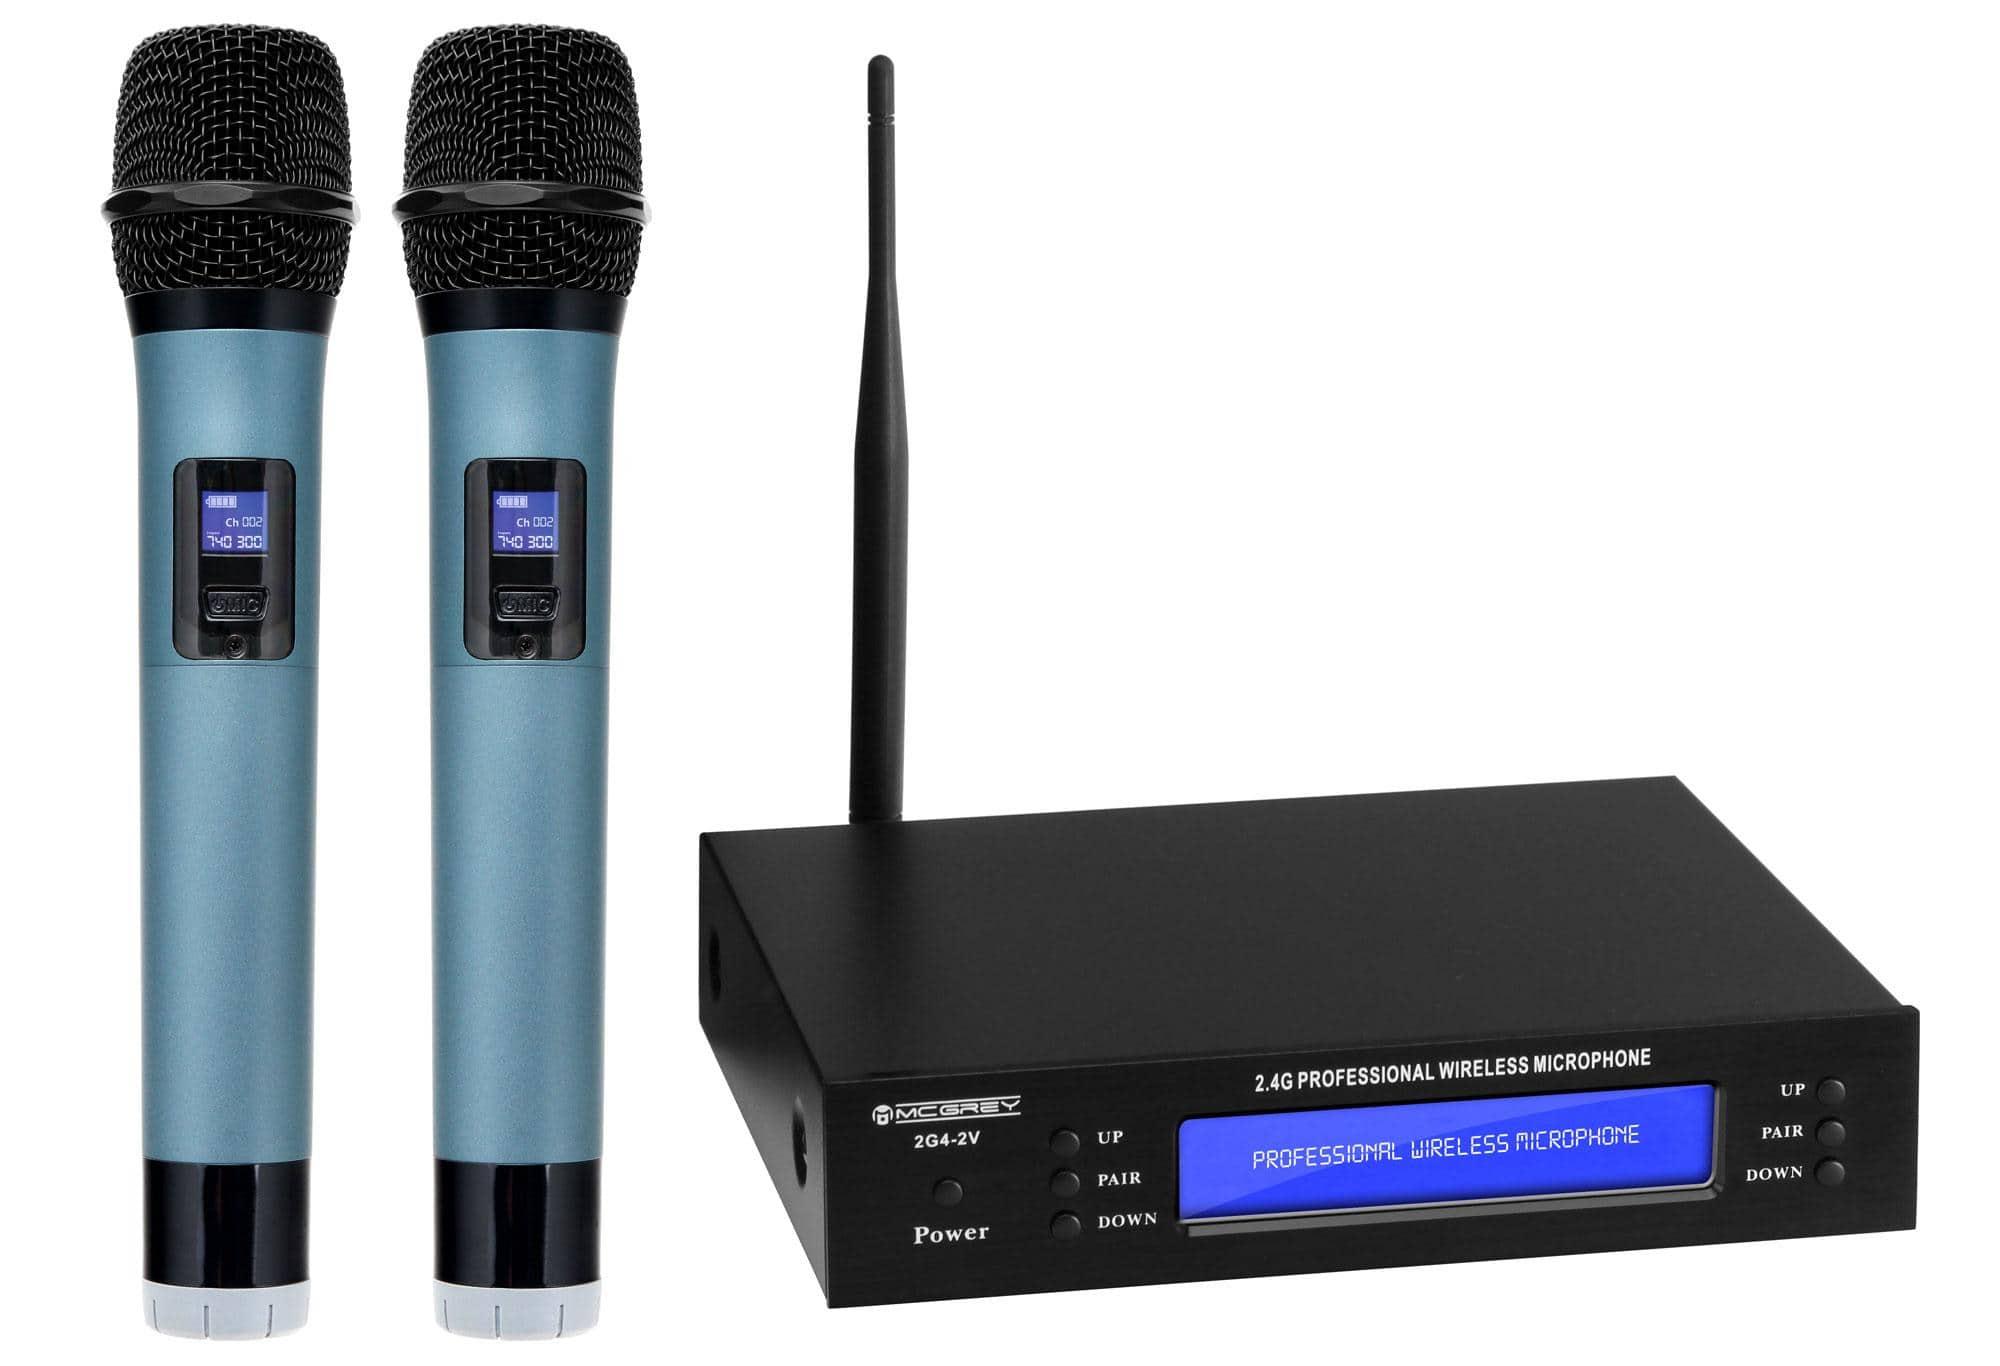 McGrey 2G4 2V Dual Vocal Funkmikrofon Set mit 2x Handmikrofon 50m